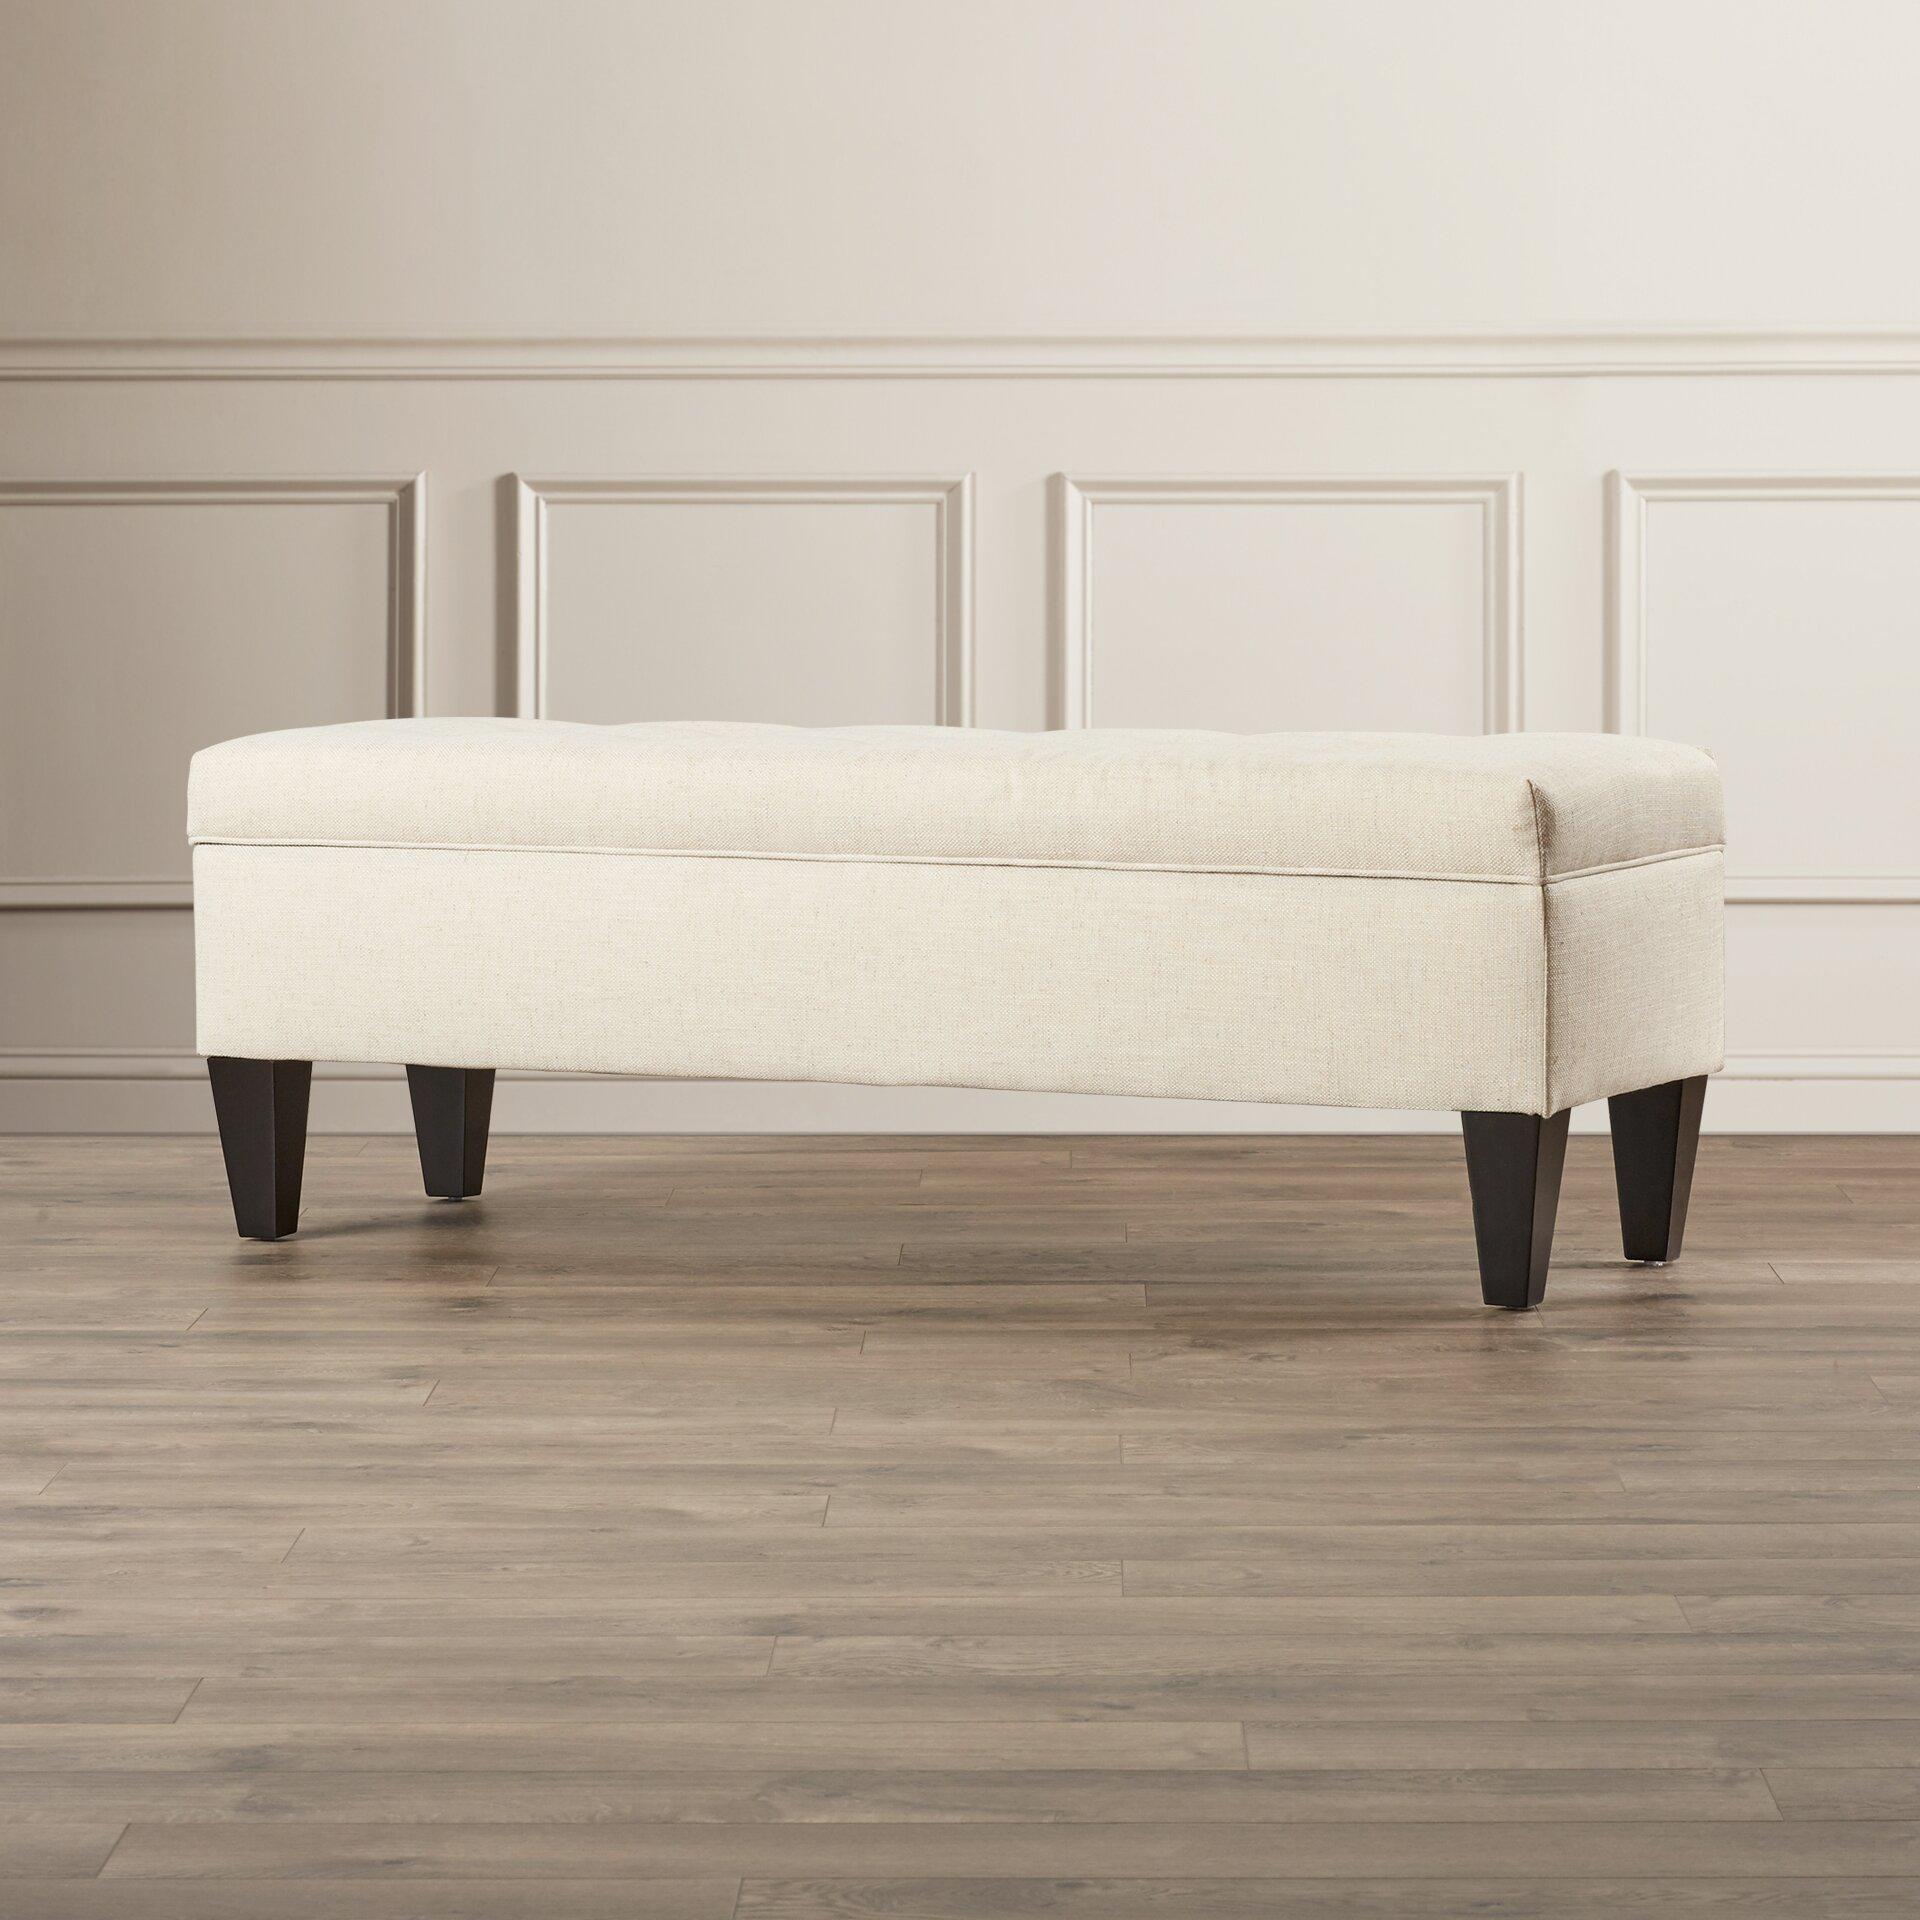 Varian Upholstered Storage Bedroom Bench Birchlane: Tusarora Fabric Storage Bedroom Bench & Reviews